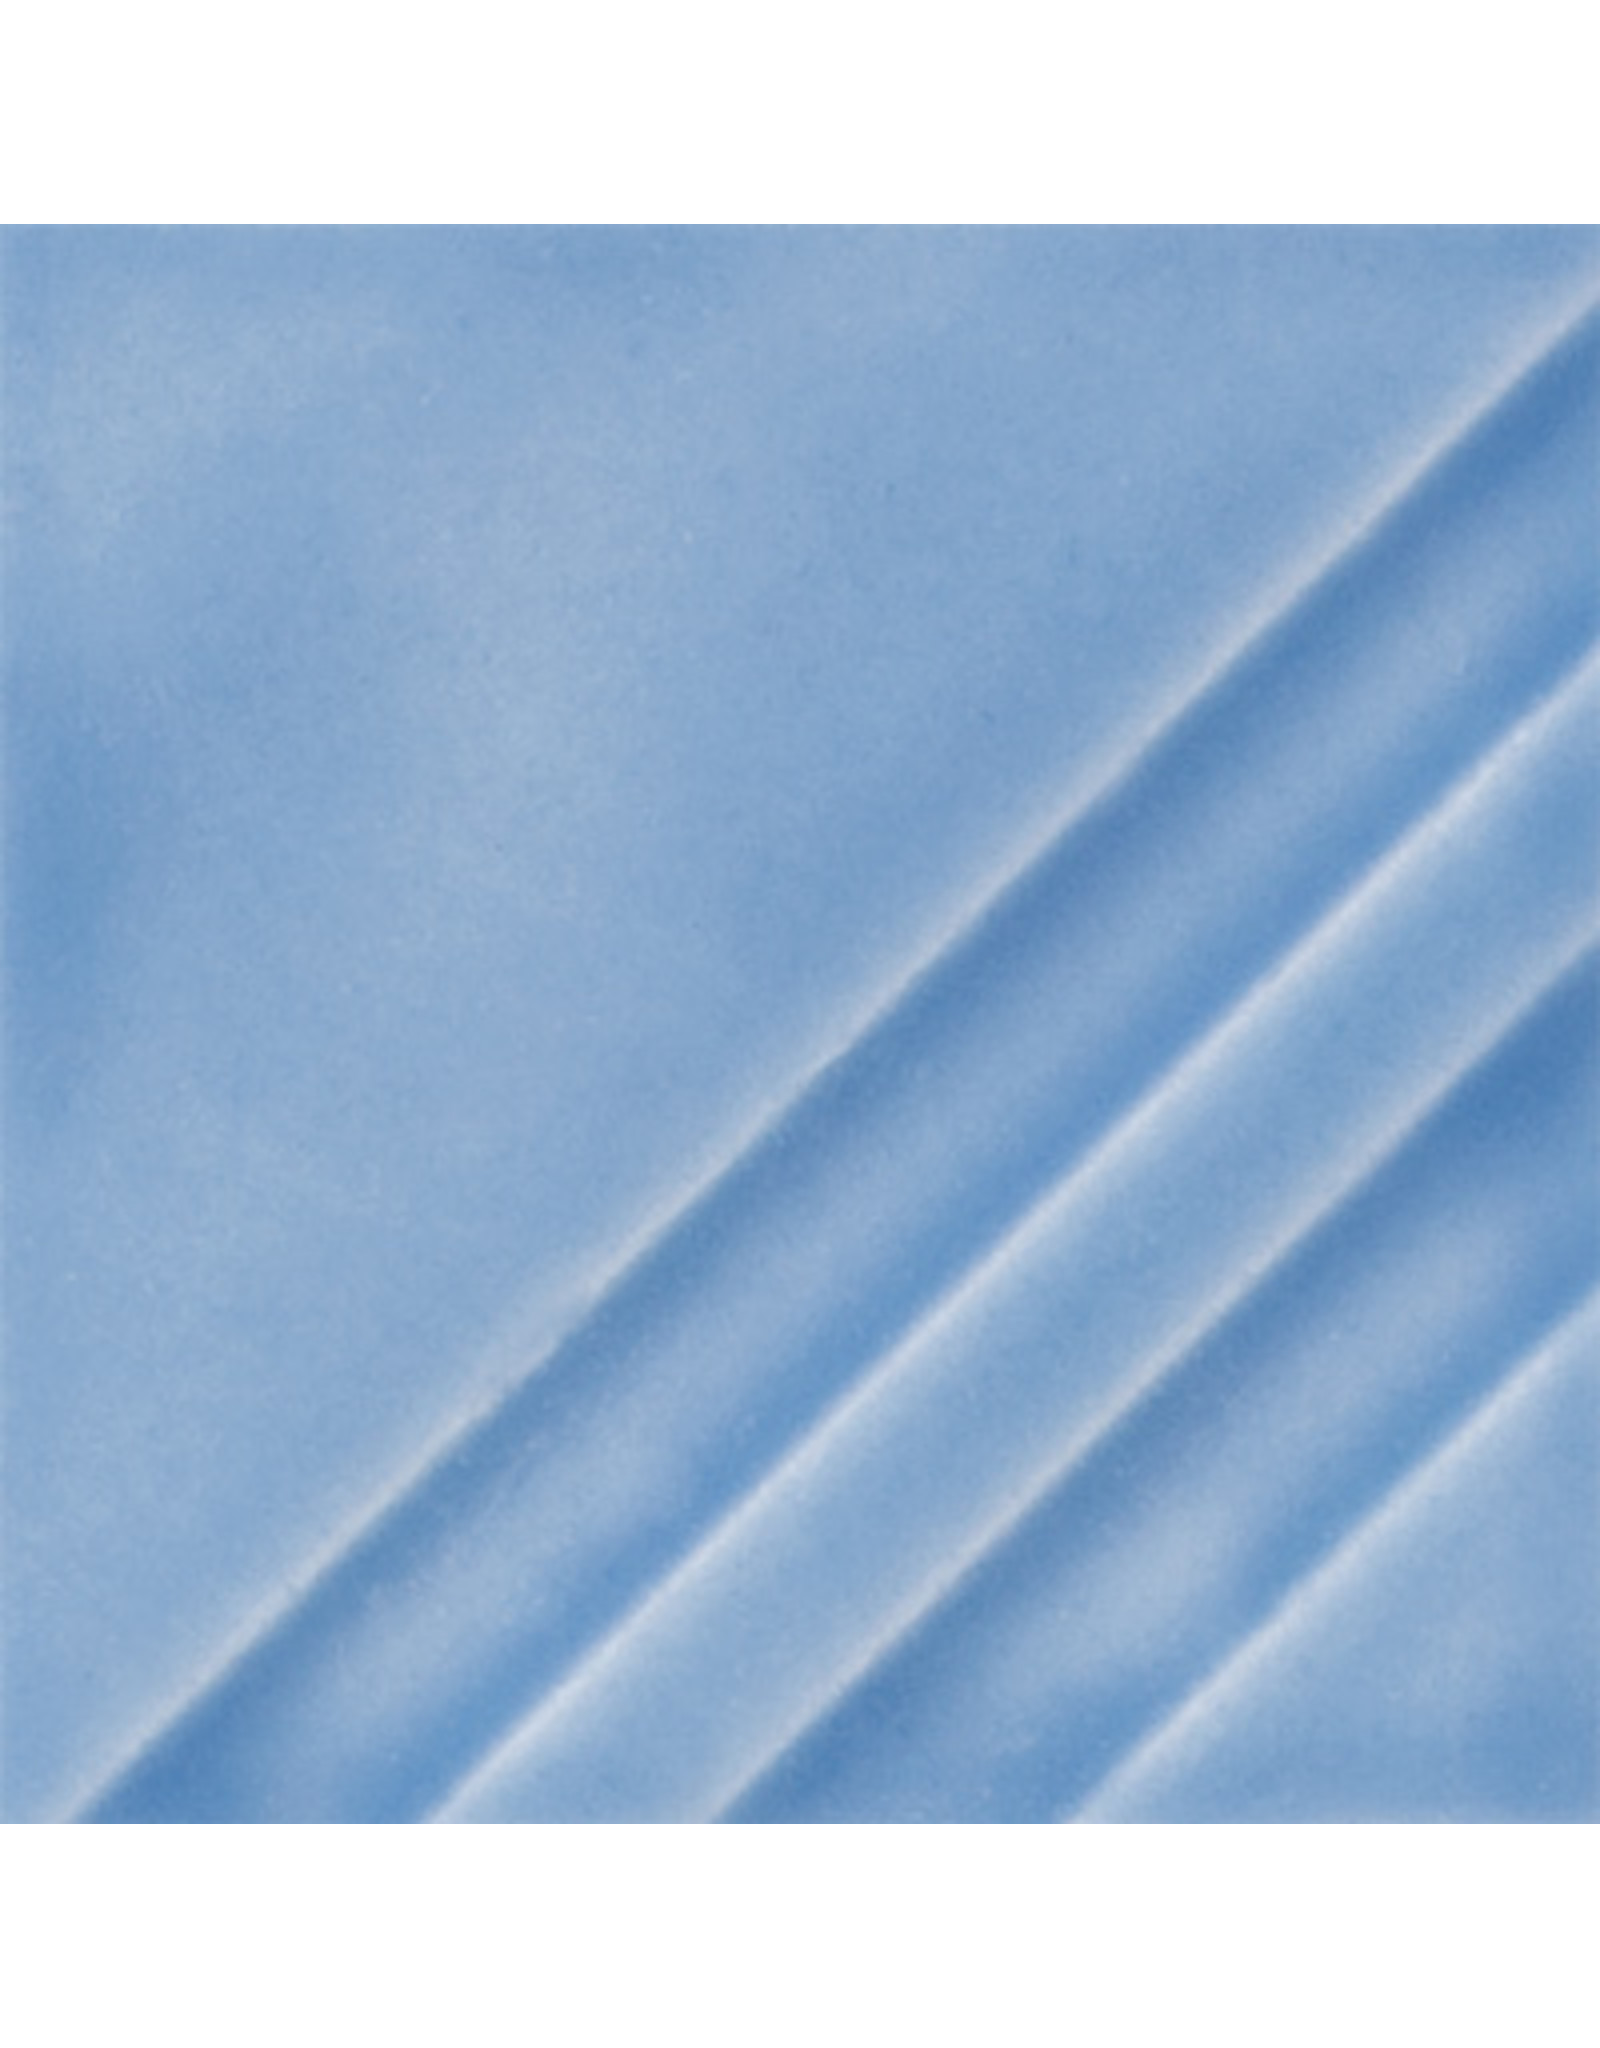 Mayco Mayco Foundations Blue Diamond 118ml